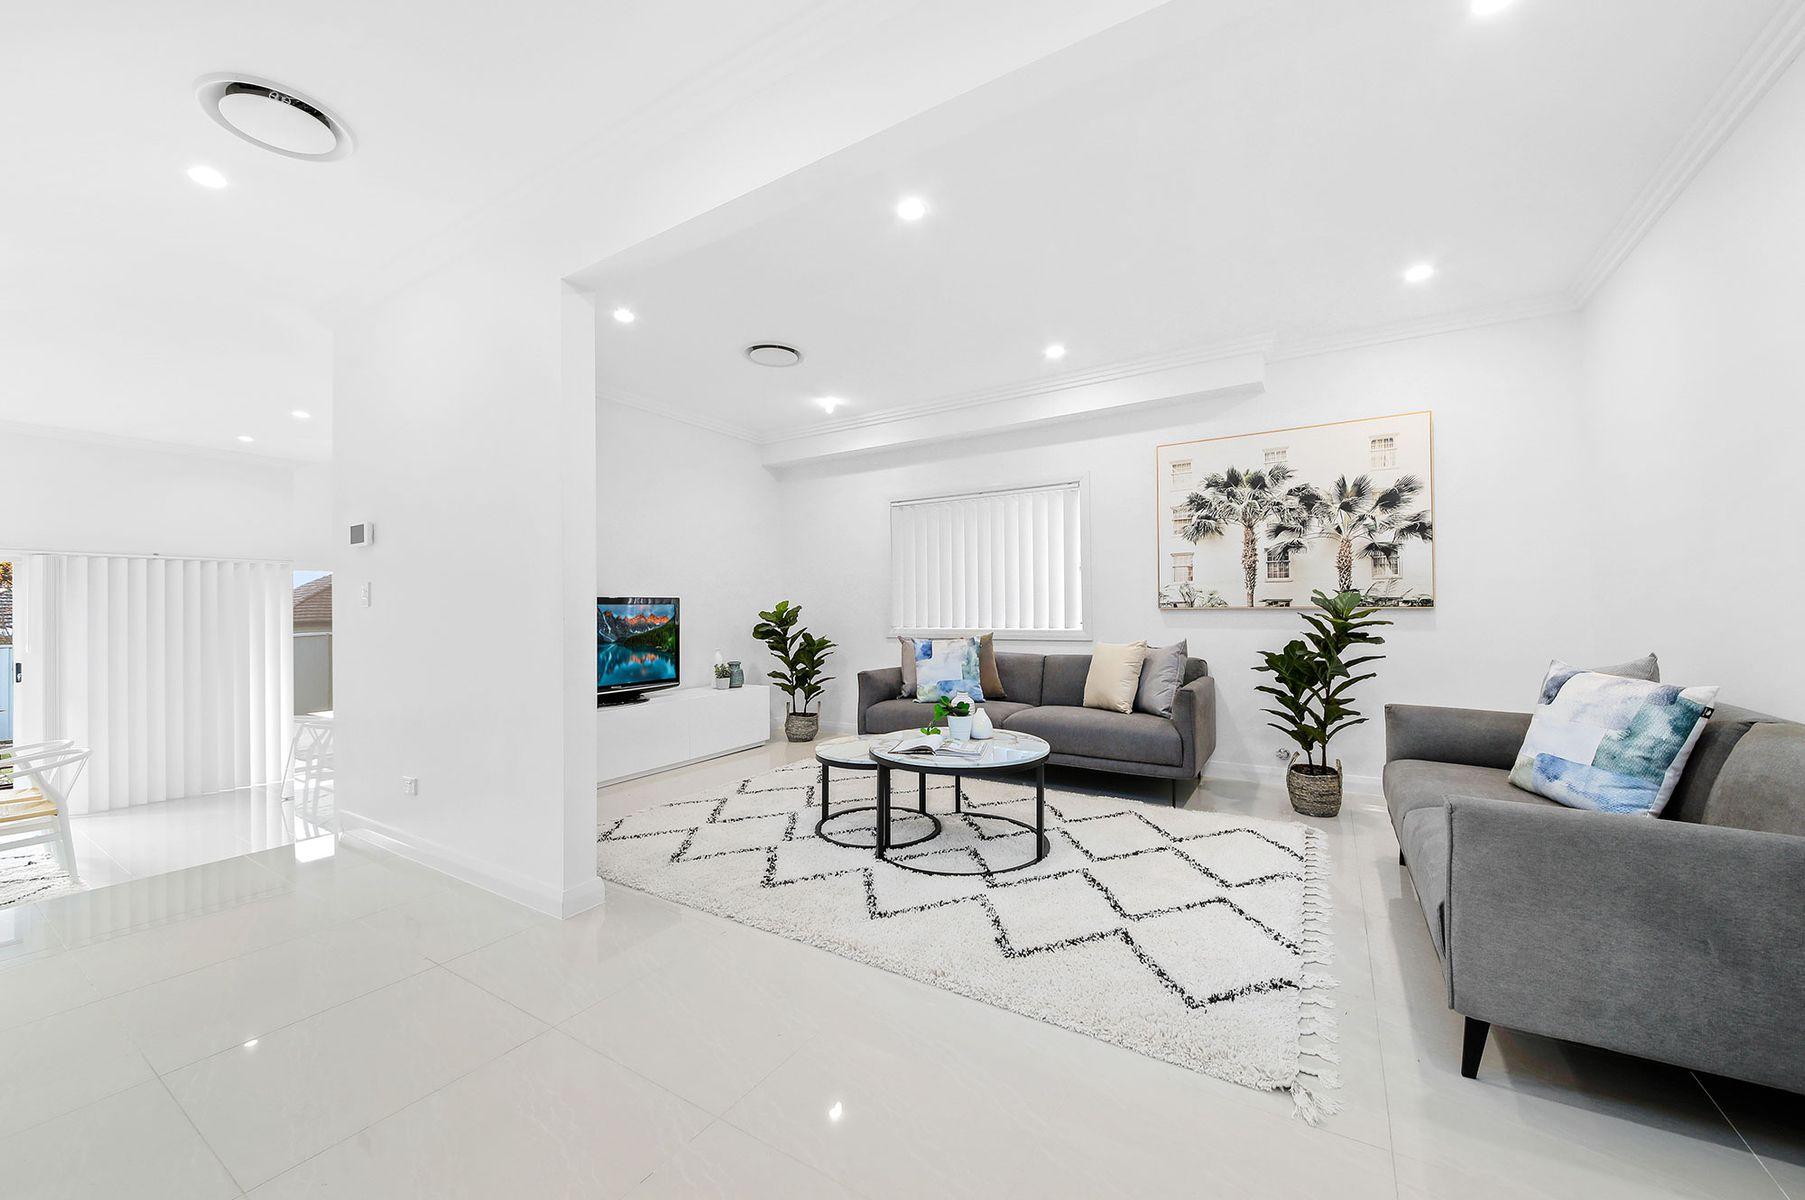 34 Cammarlie Street, Panania, NSW 2213